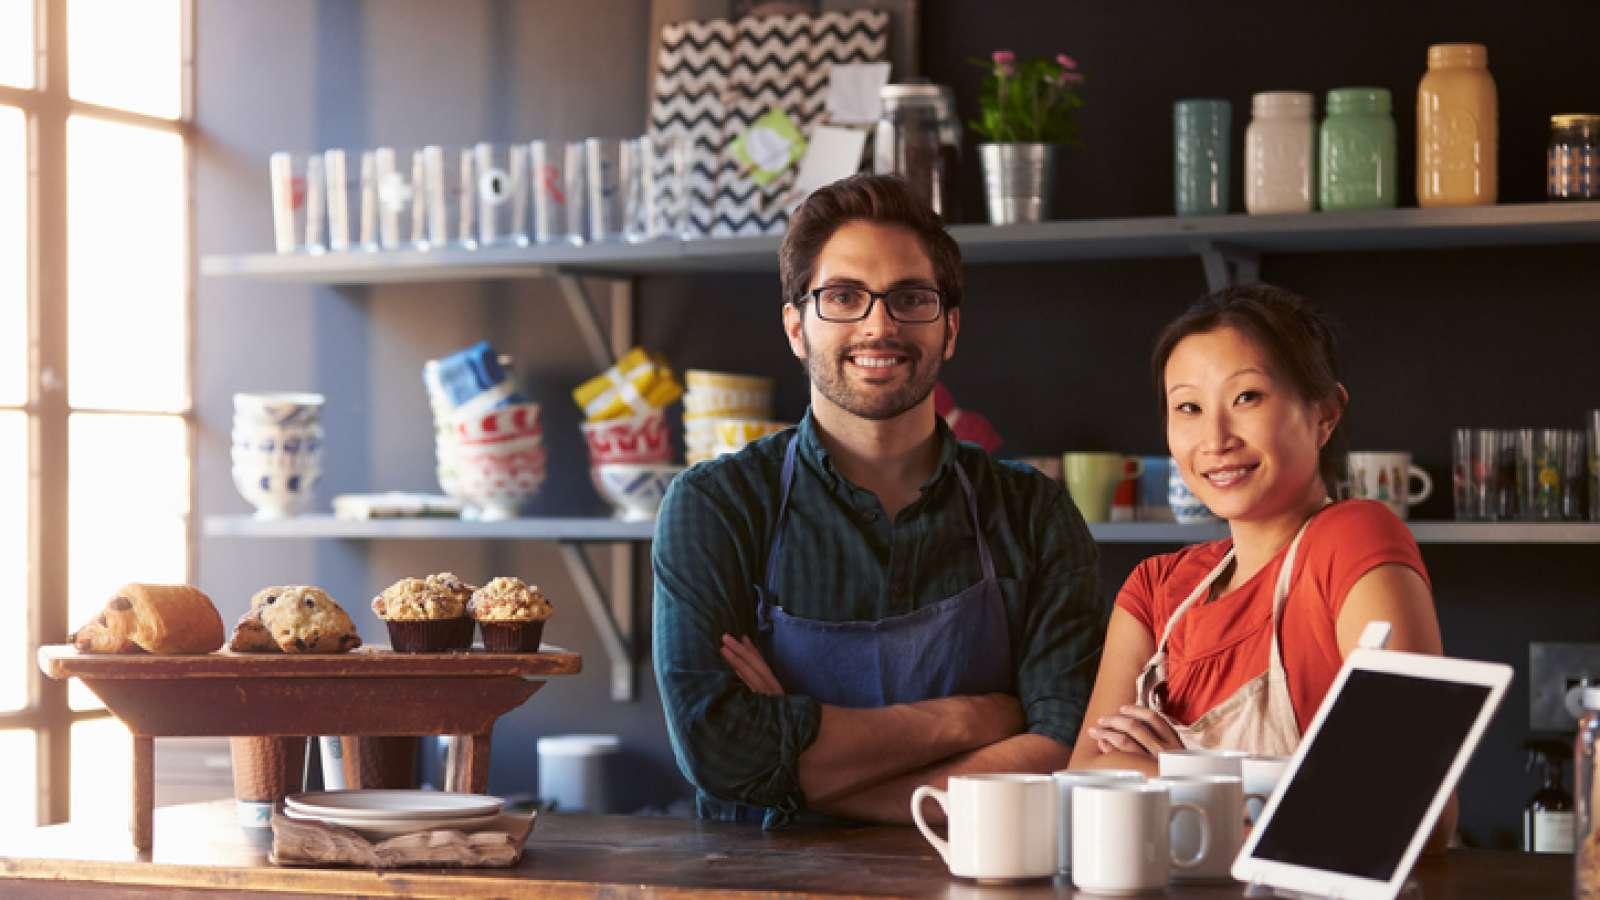 Man and woman behind counter at store